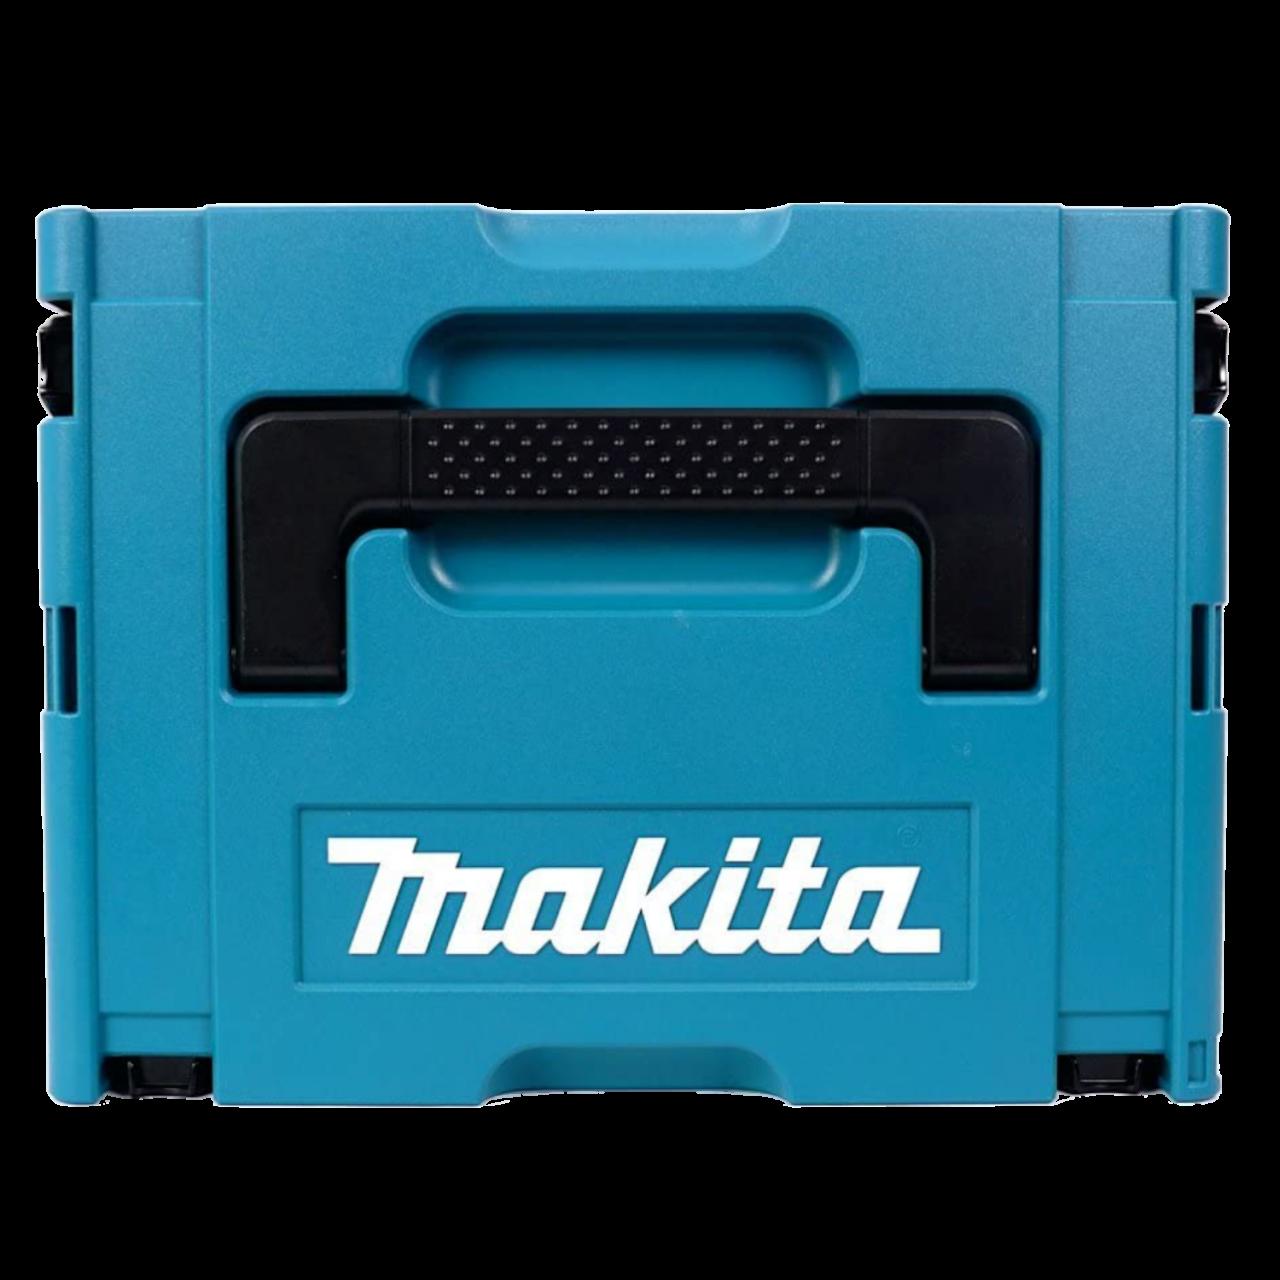 Makita 821550-0 MAKPAC Gr. 2 inkl. Einlage, 395x295x163 mm